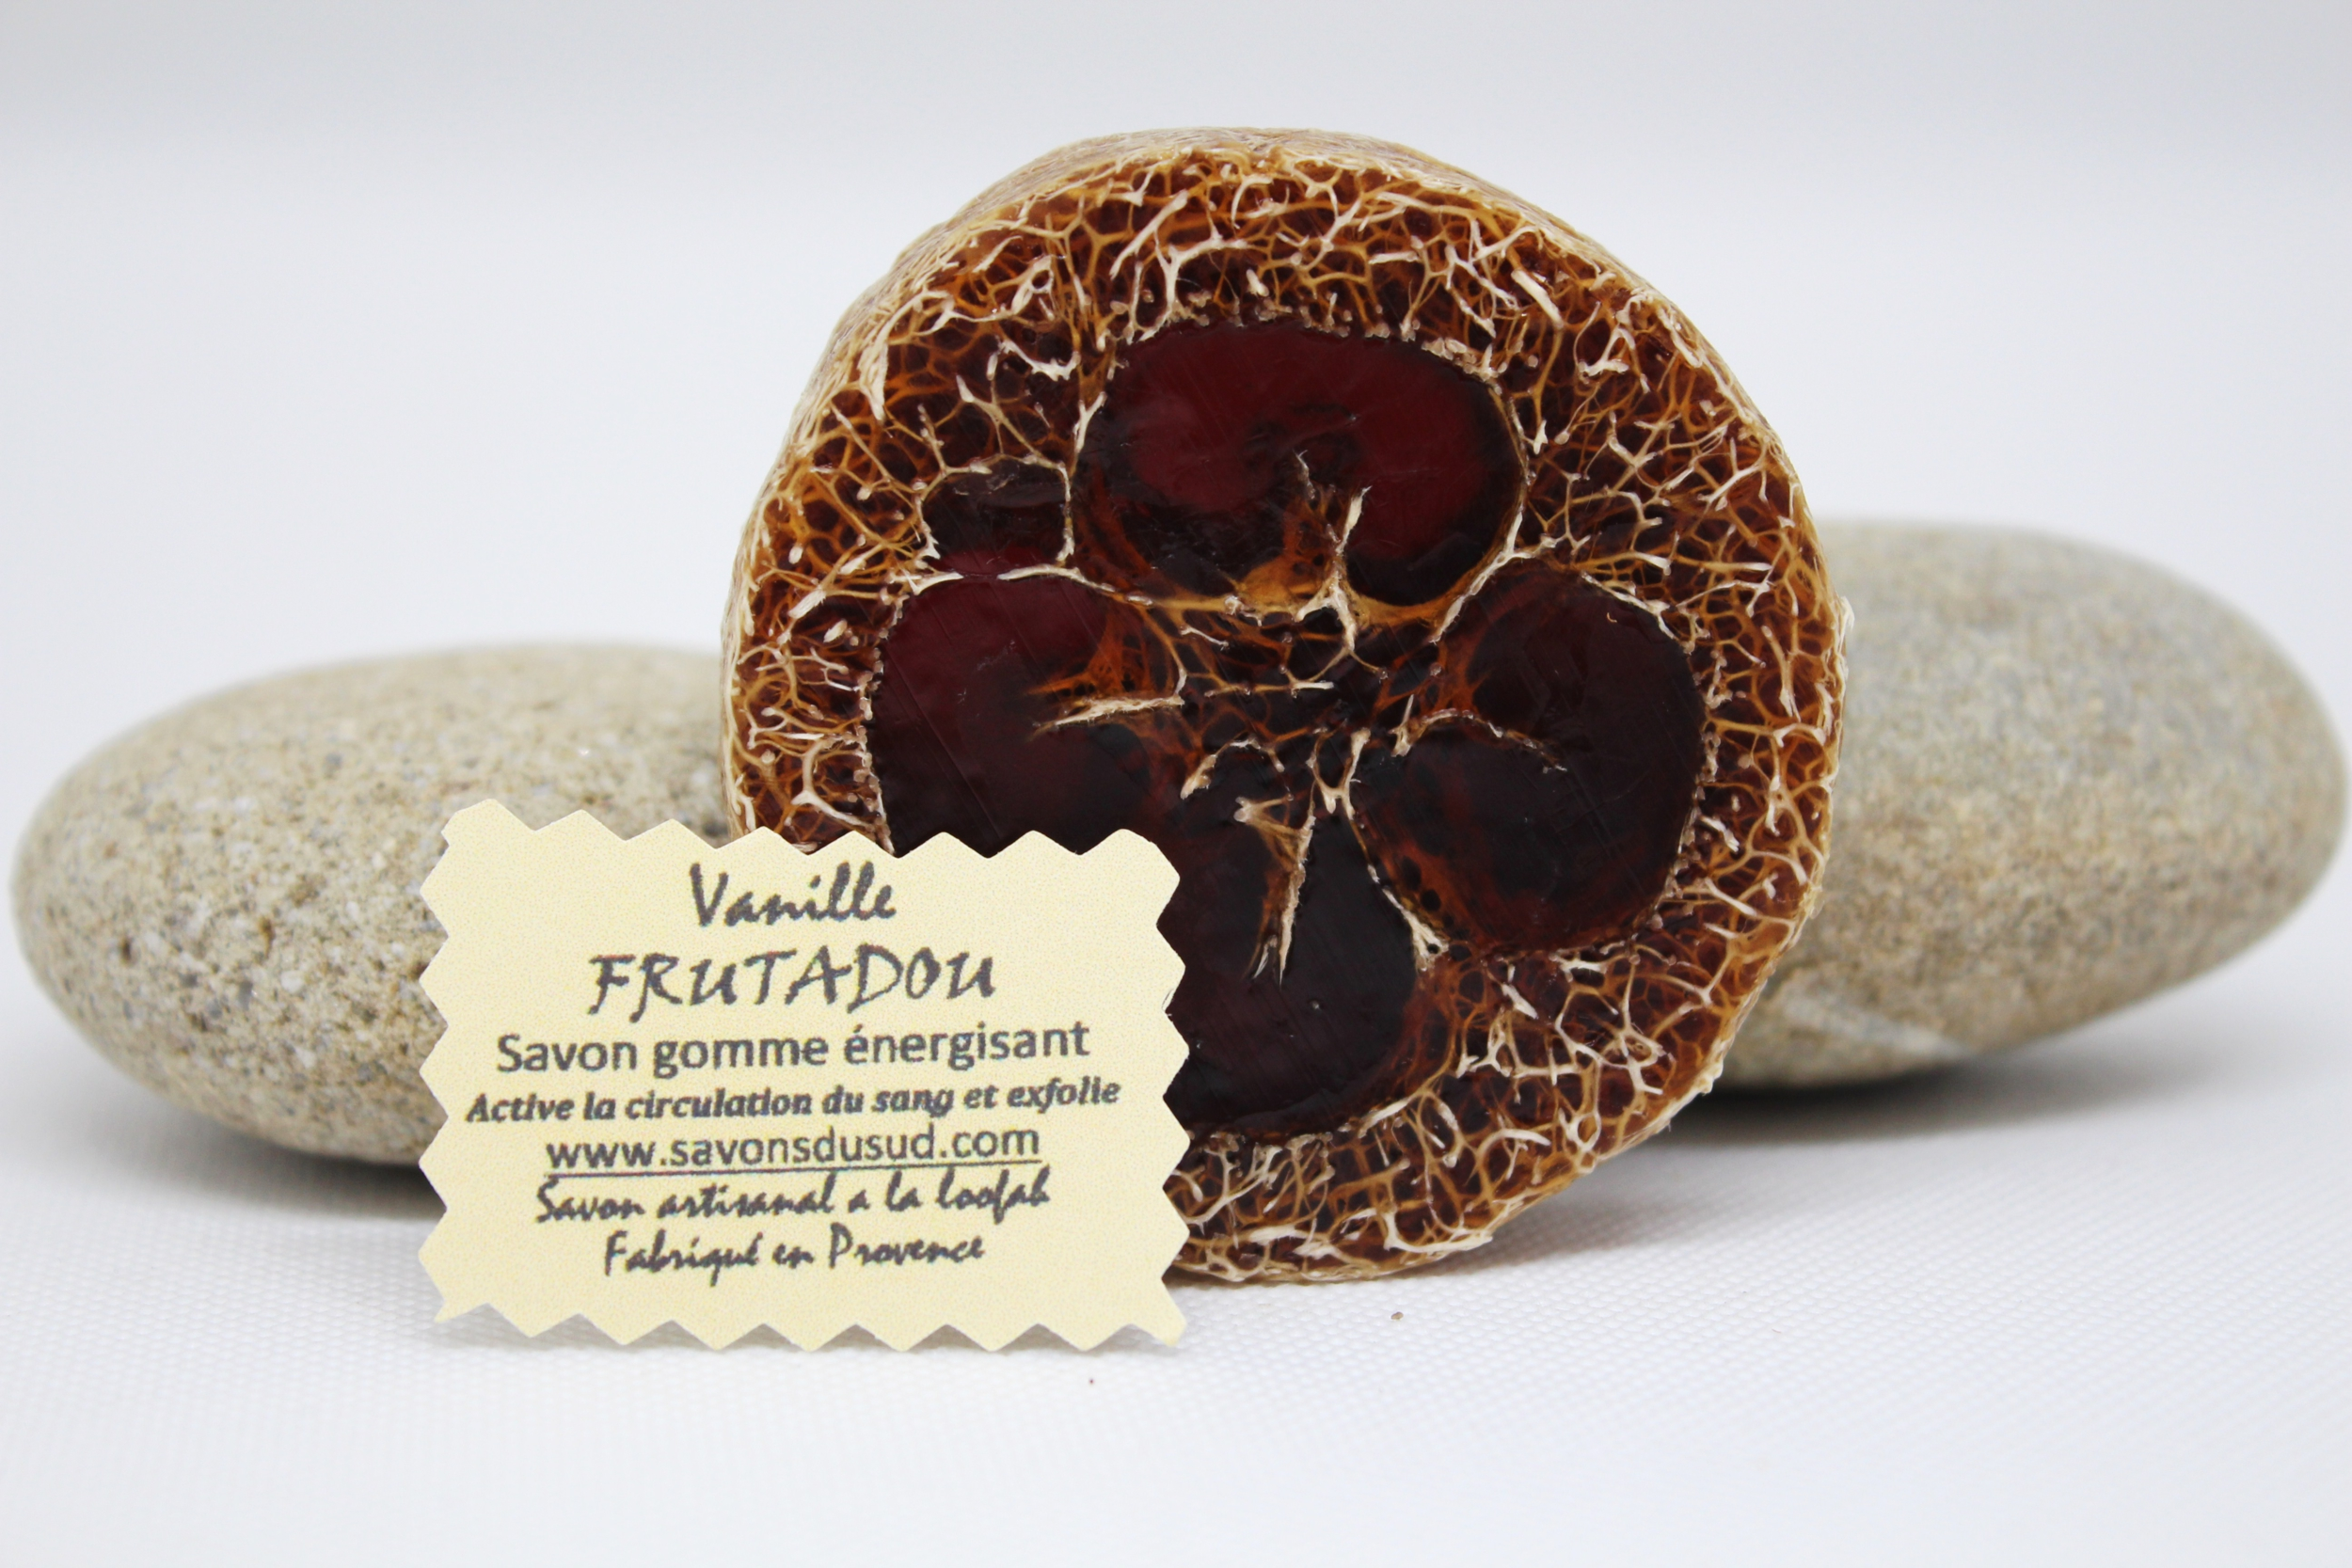 Frutadou Vanille